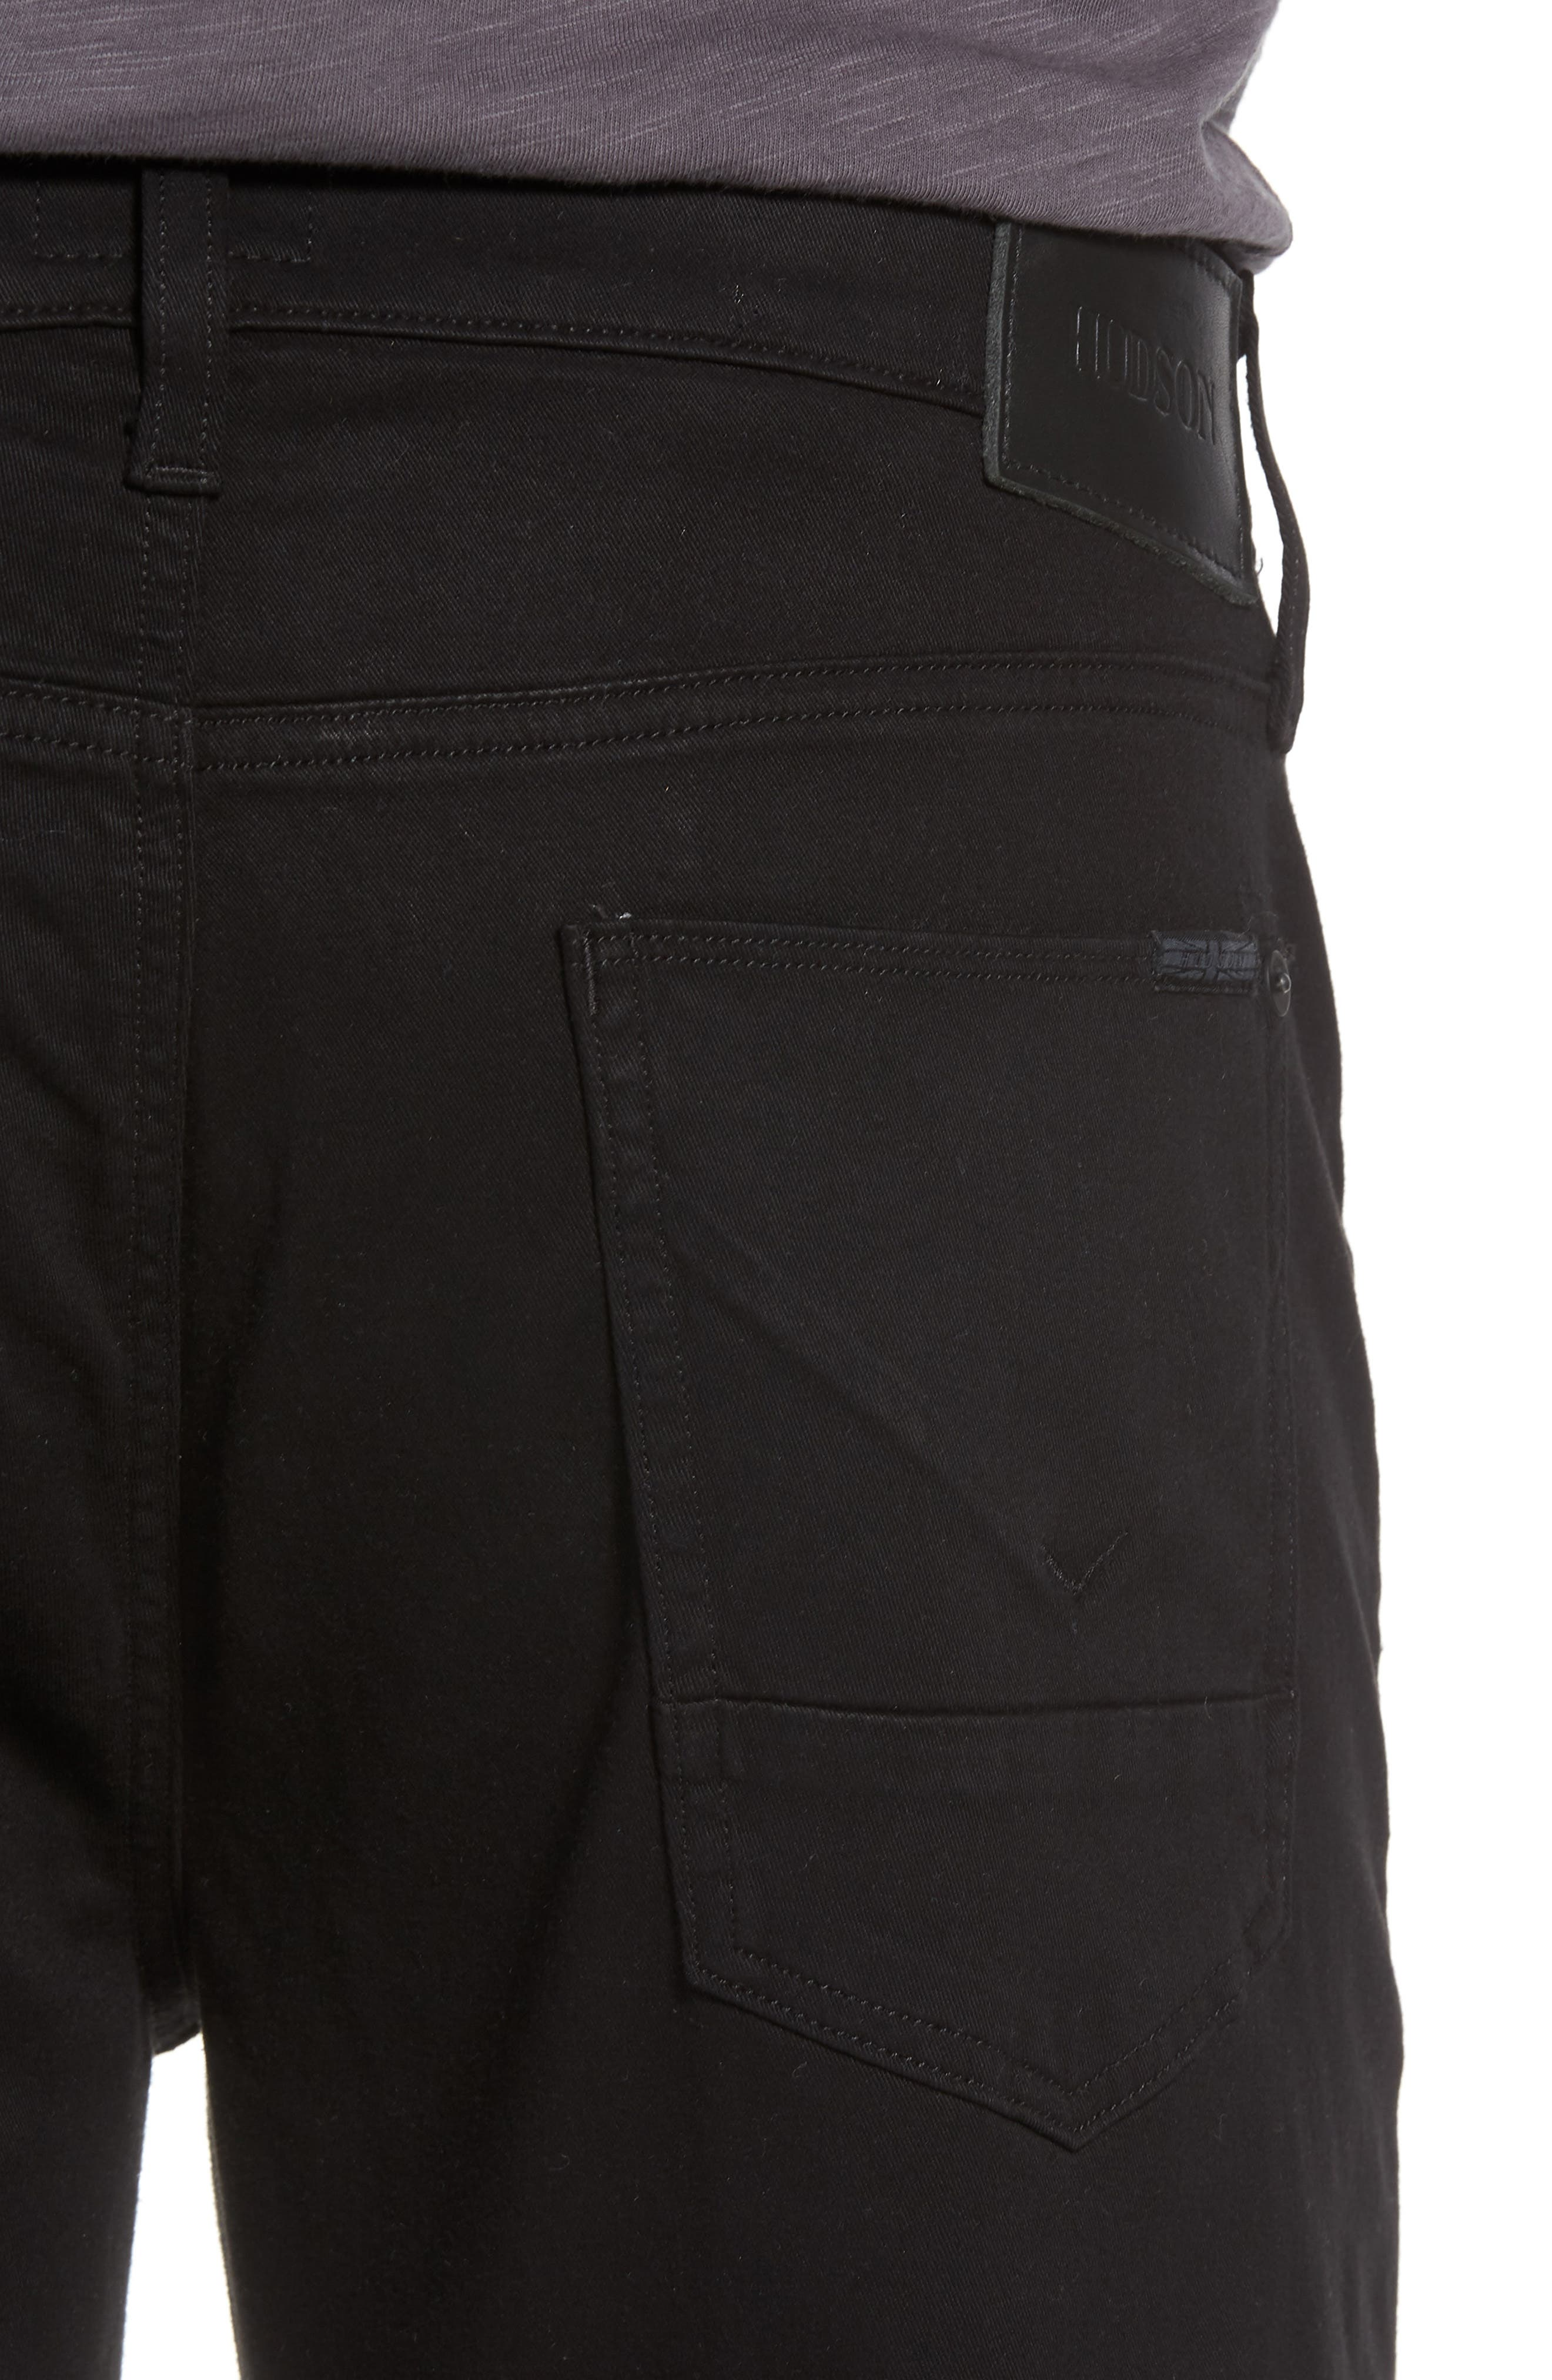 Byron Slim Straight Leg Jeans,                             Alternate thumbnail 4, color,                             001